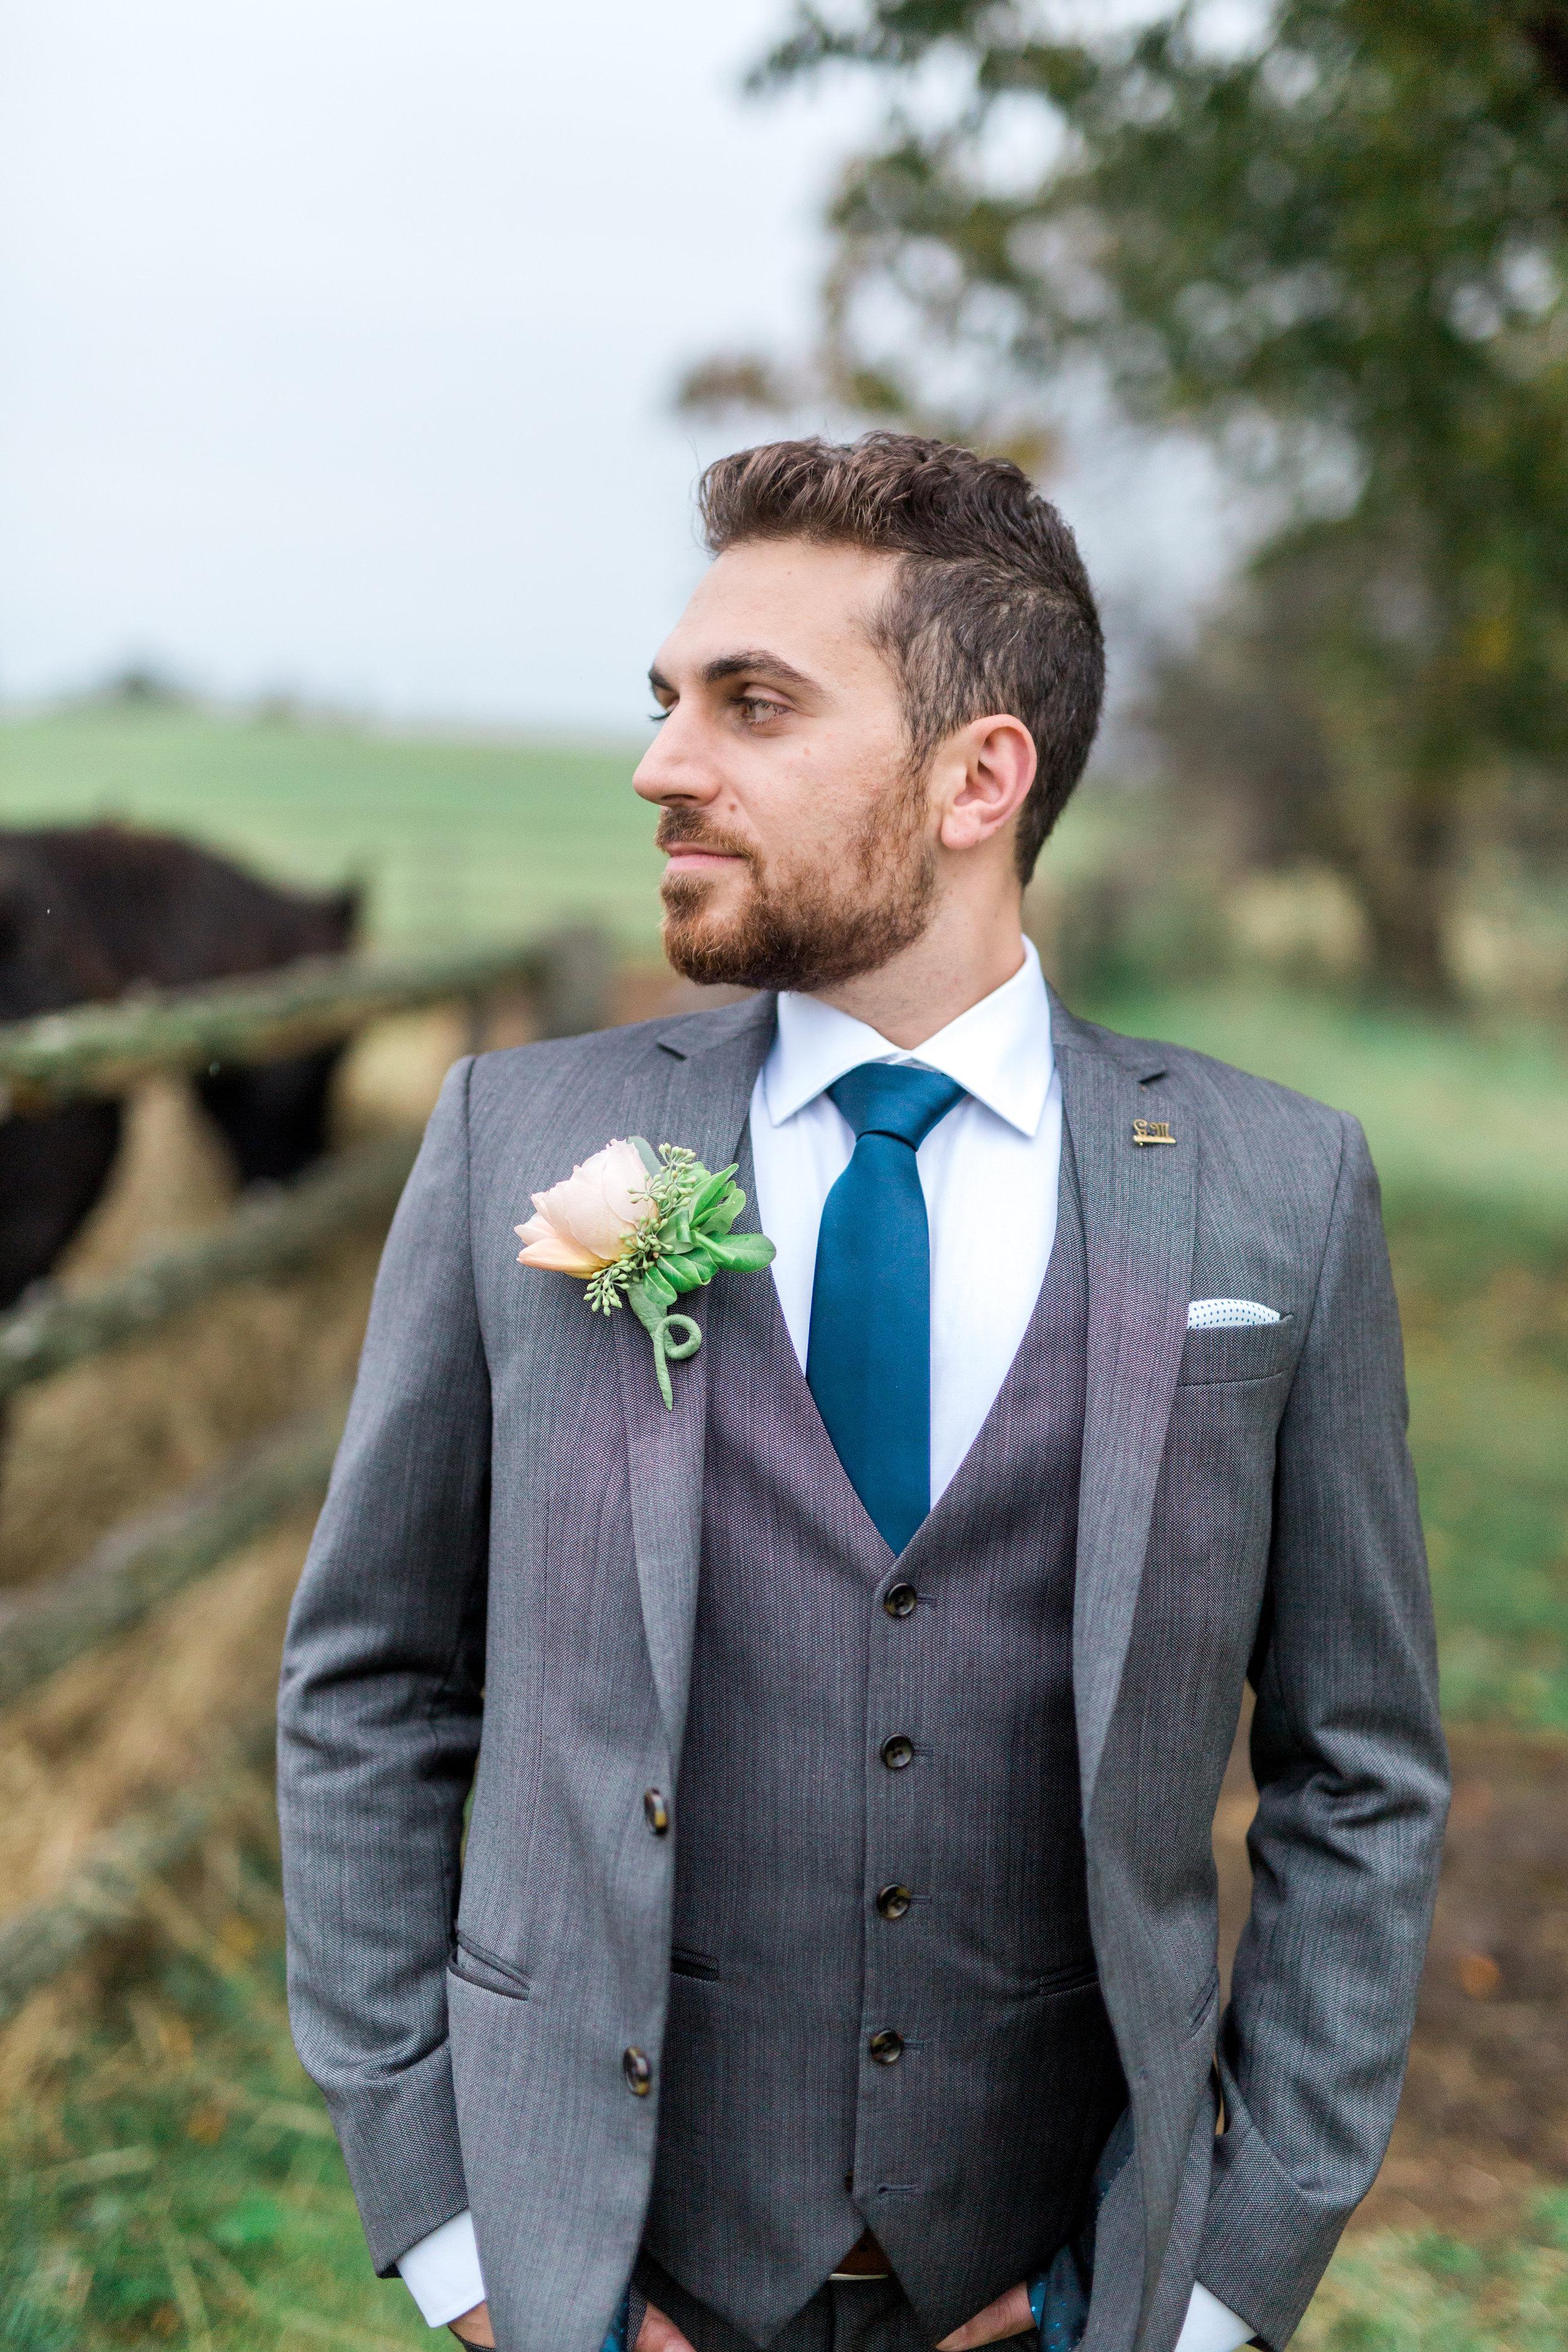 Amir-Golbazi-Danielle-Giroux-Photography_Toronto-Wedding_Cedarwood_Rachel-Paul_553.jpg